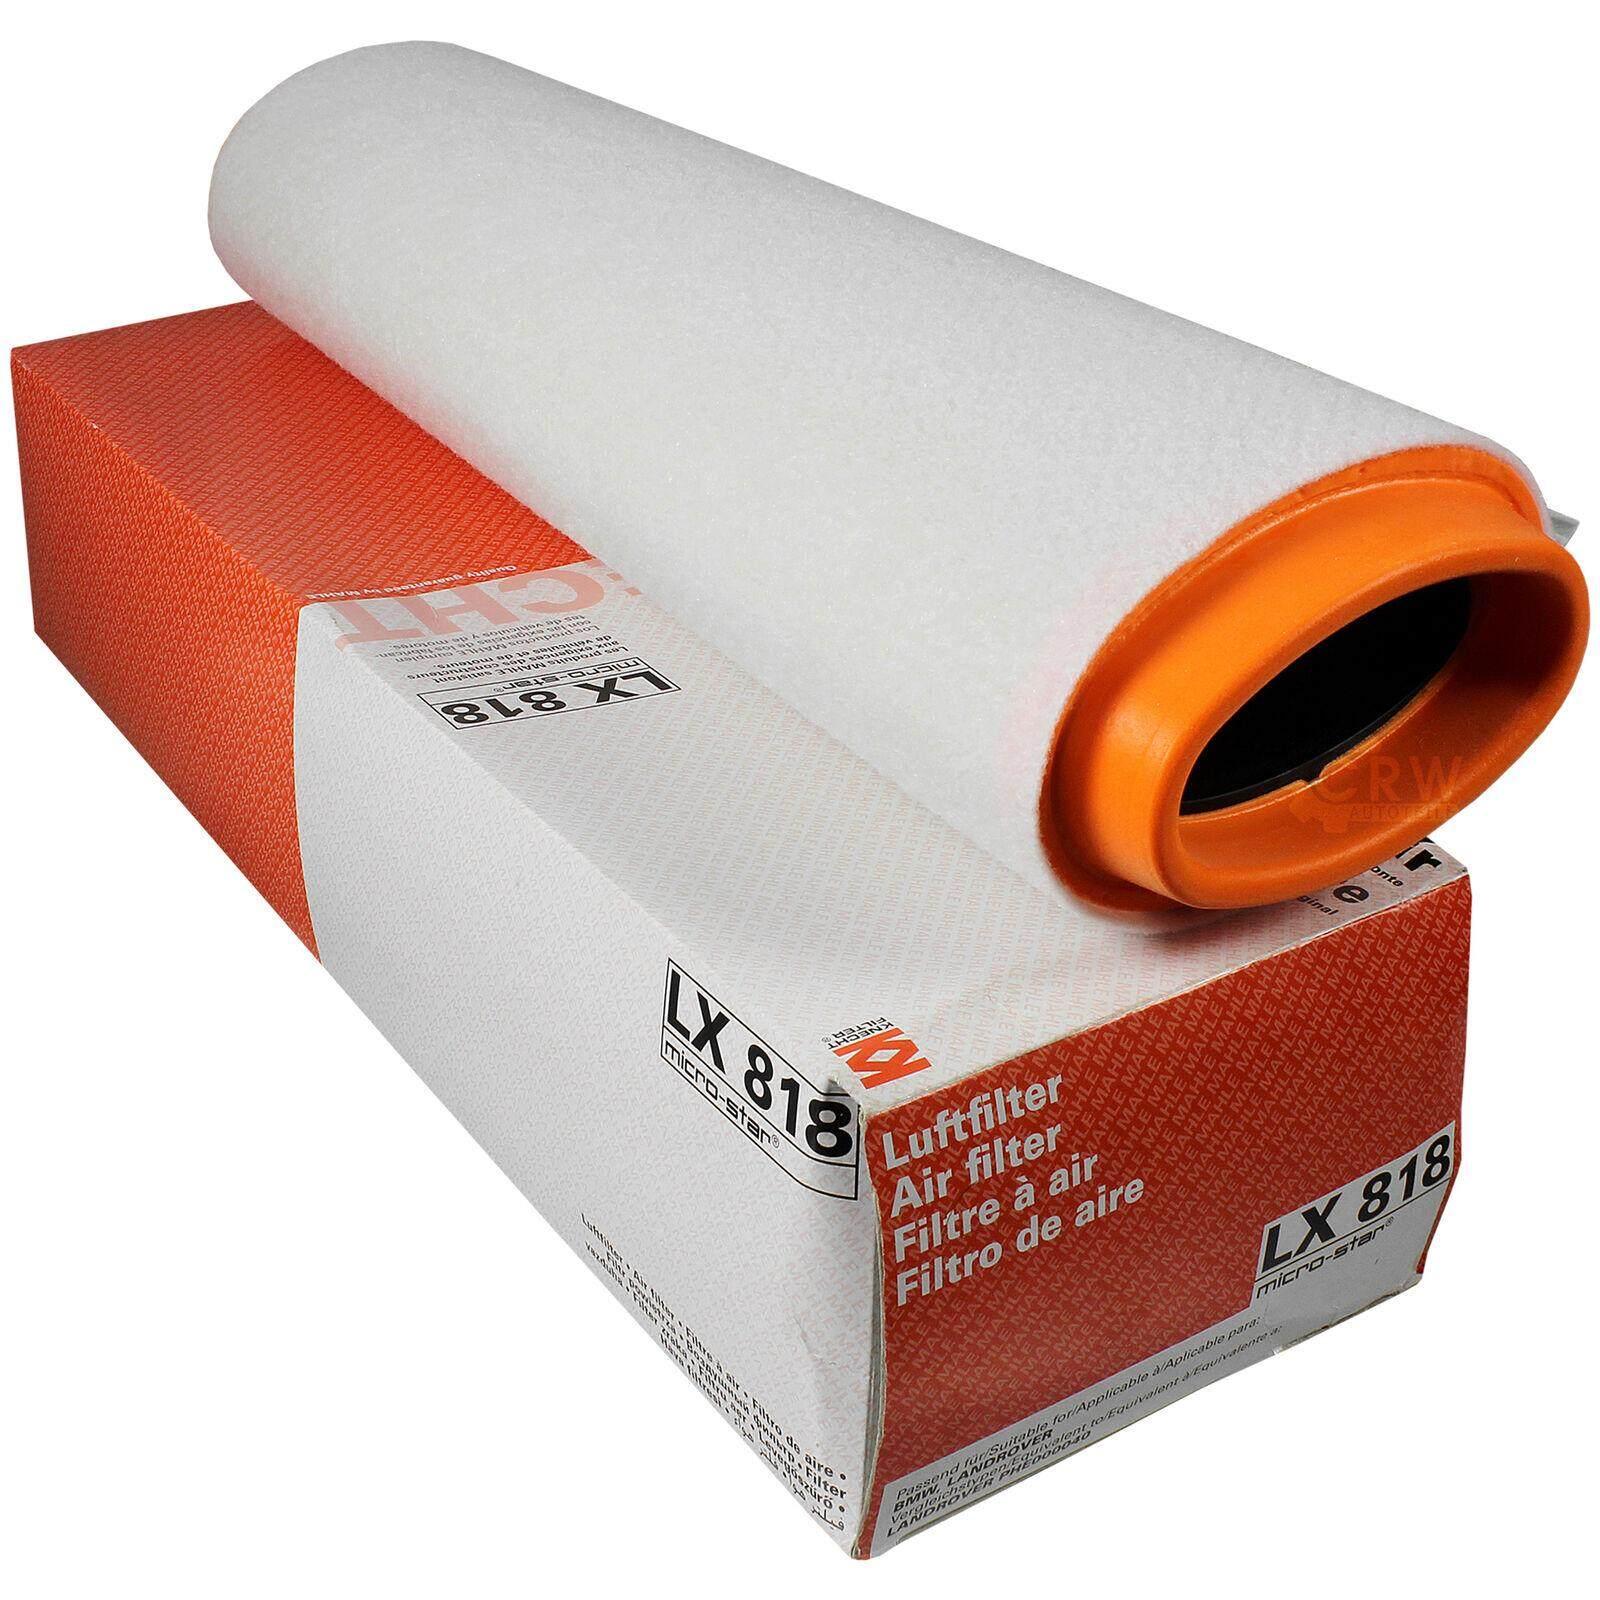 Knecht LX823 Filtre /à air